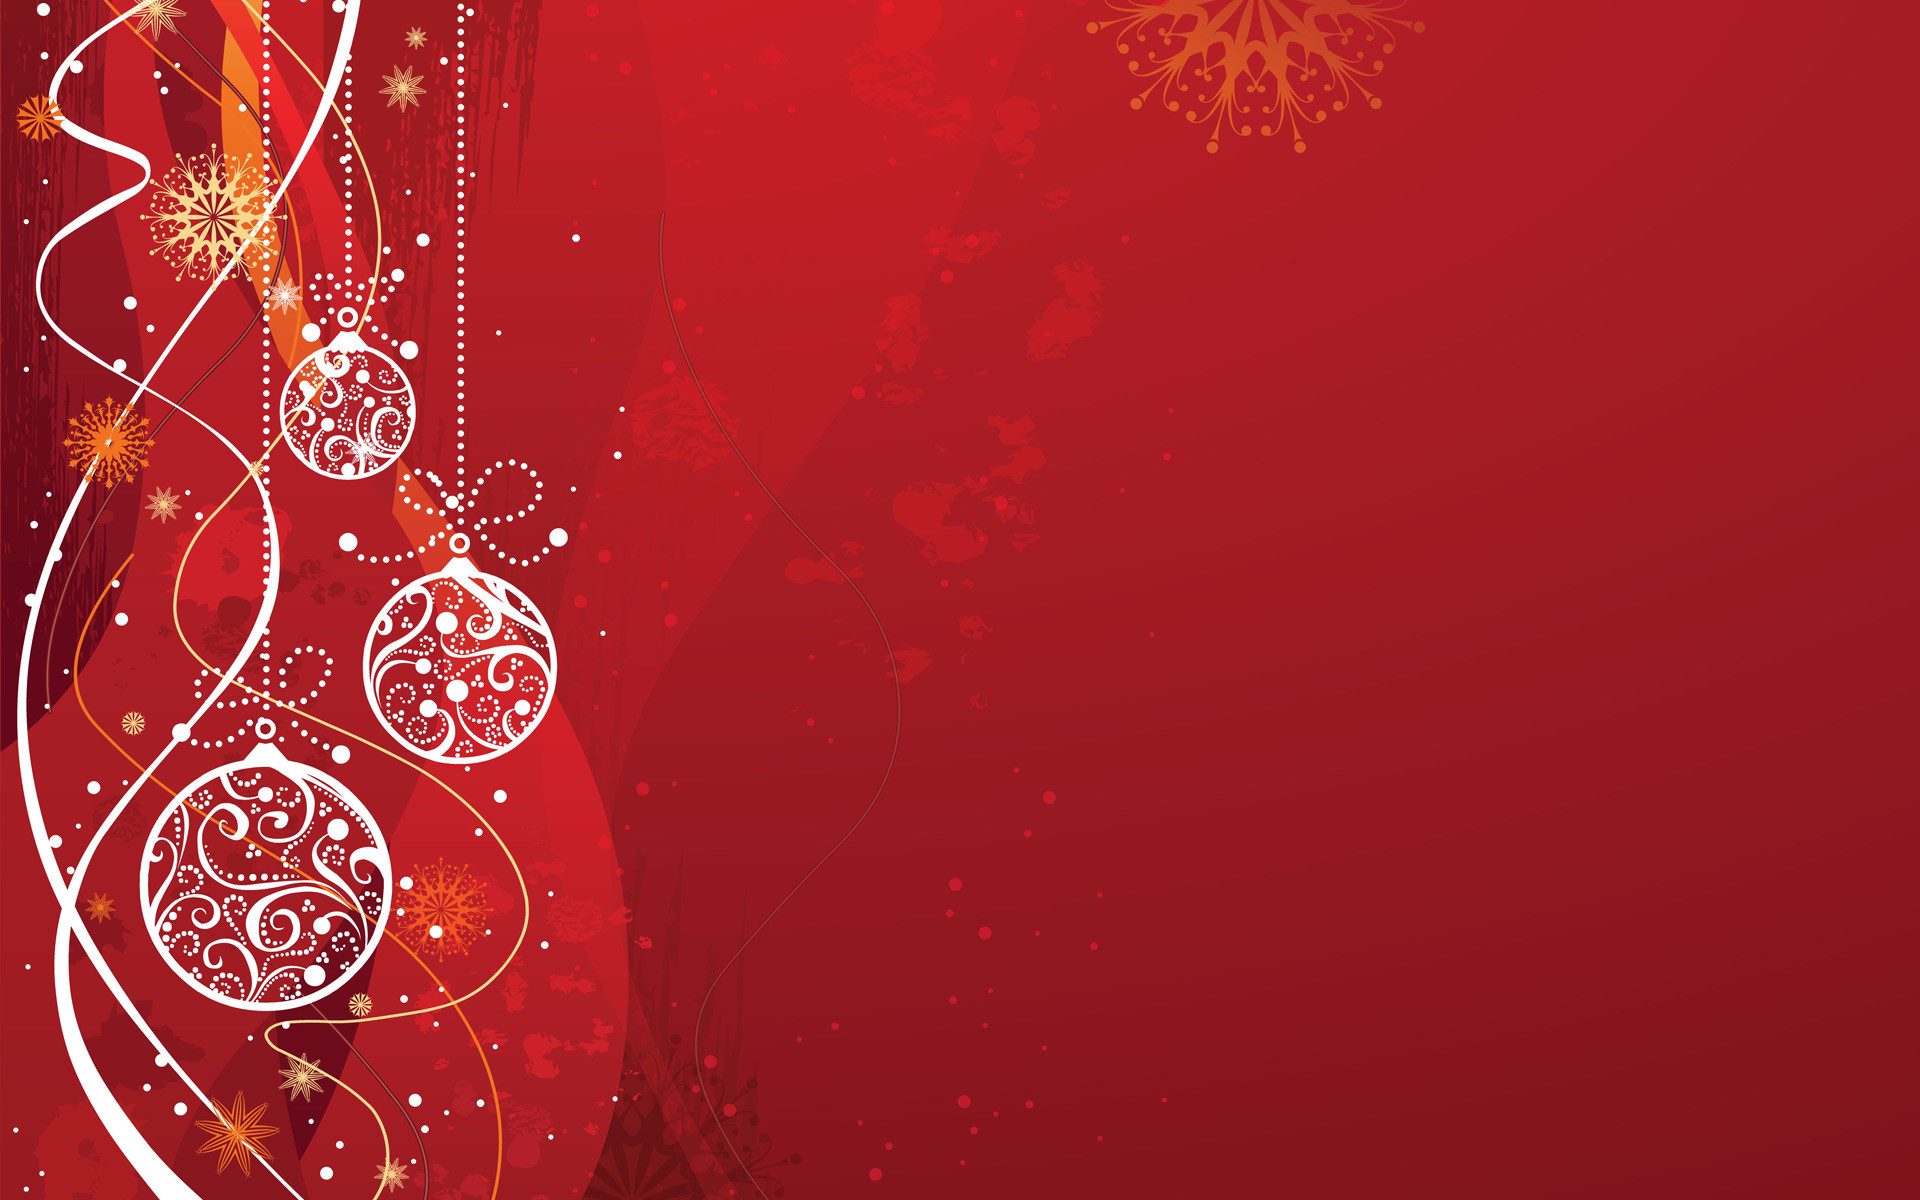 Sfondi Natalizi Oro.Sfondi Natale 52 Immagini